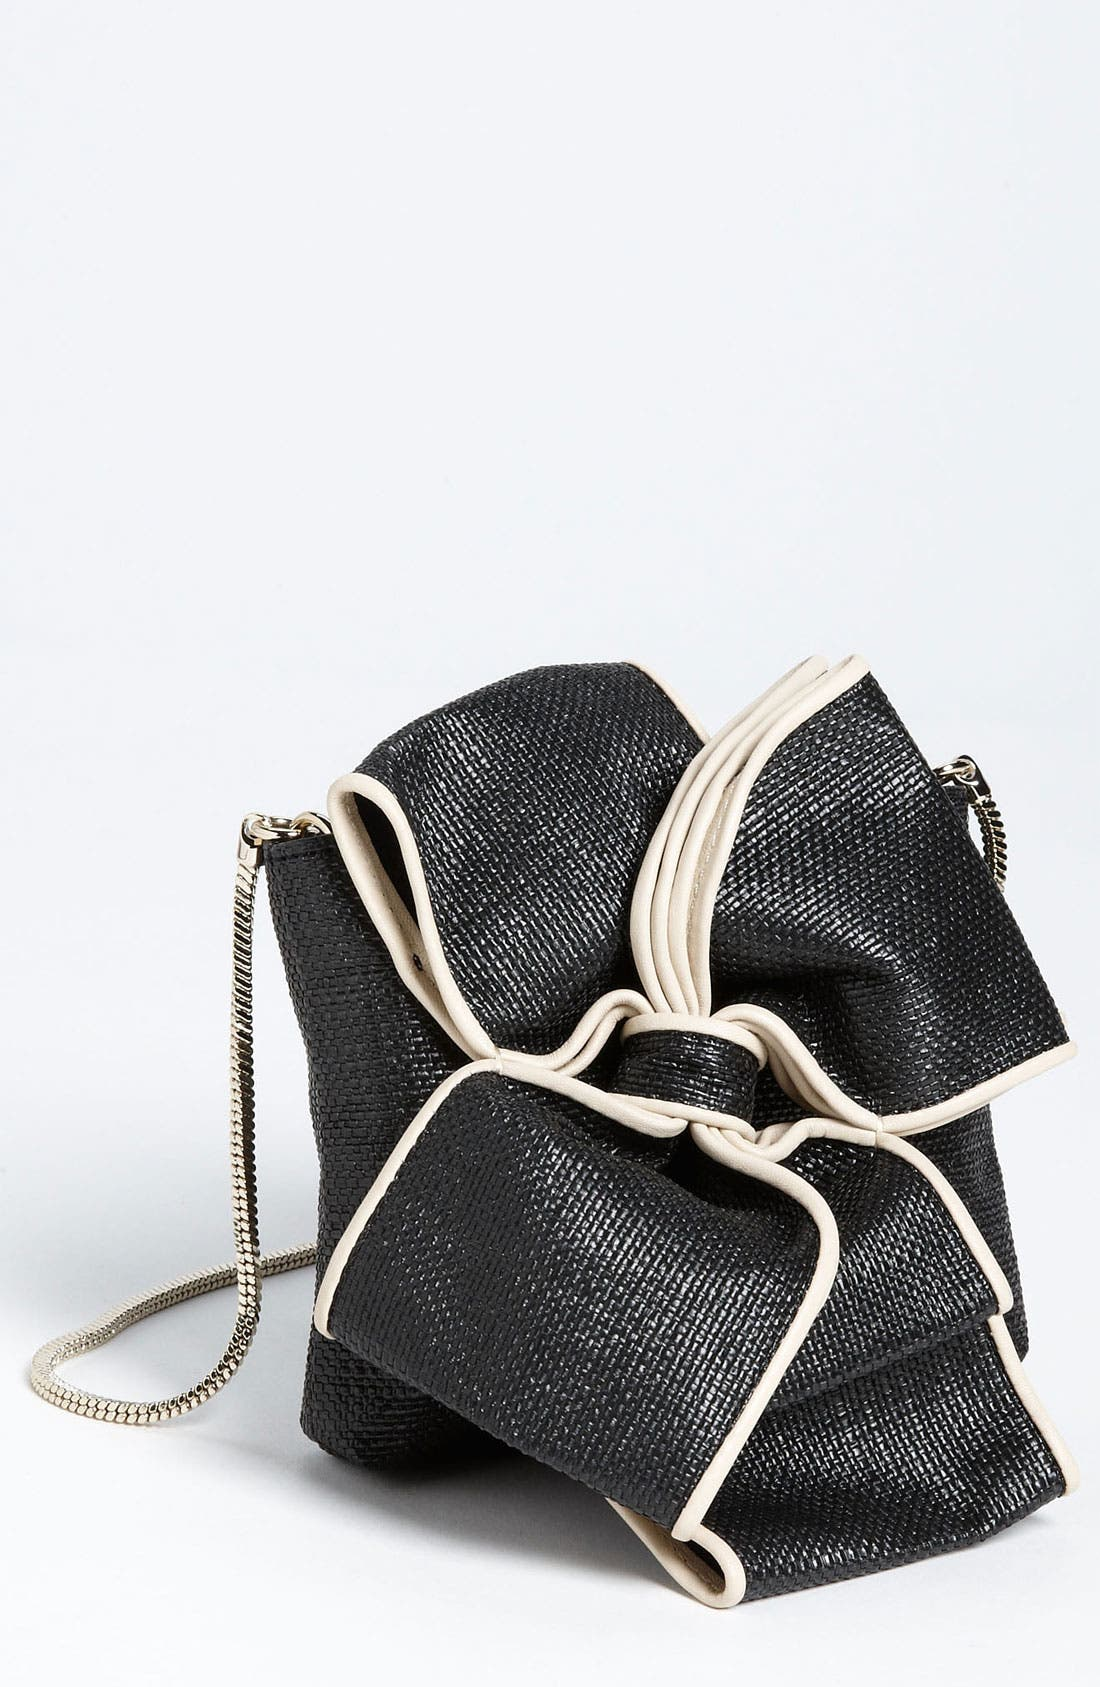 Main Image - kate spade new york 'hope avenue - attie' crossbody bag